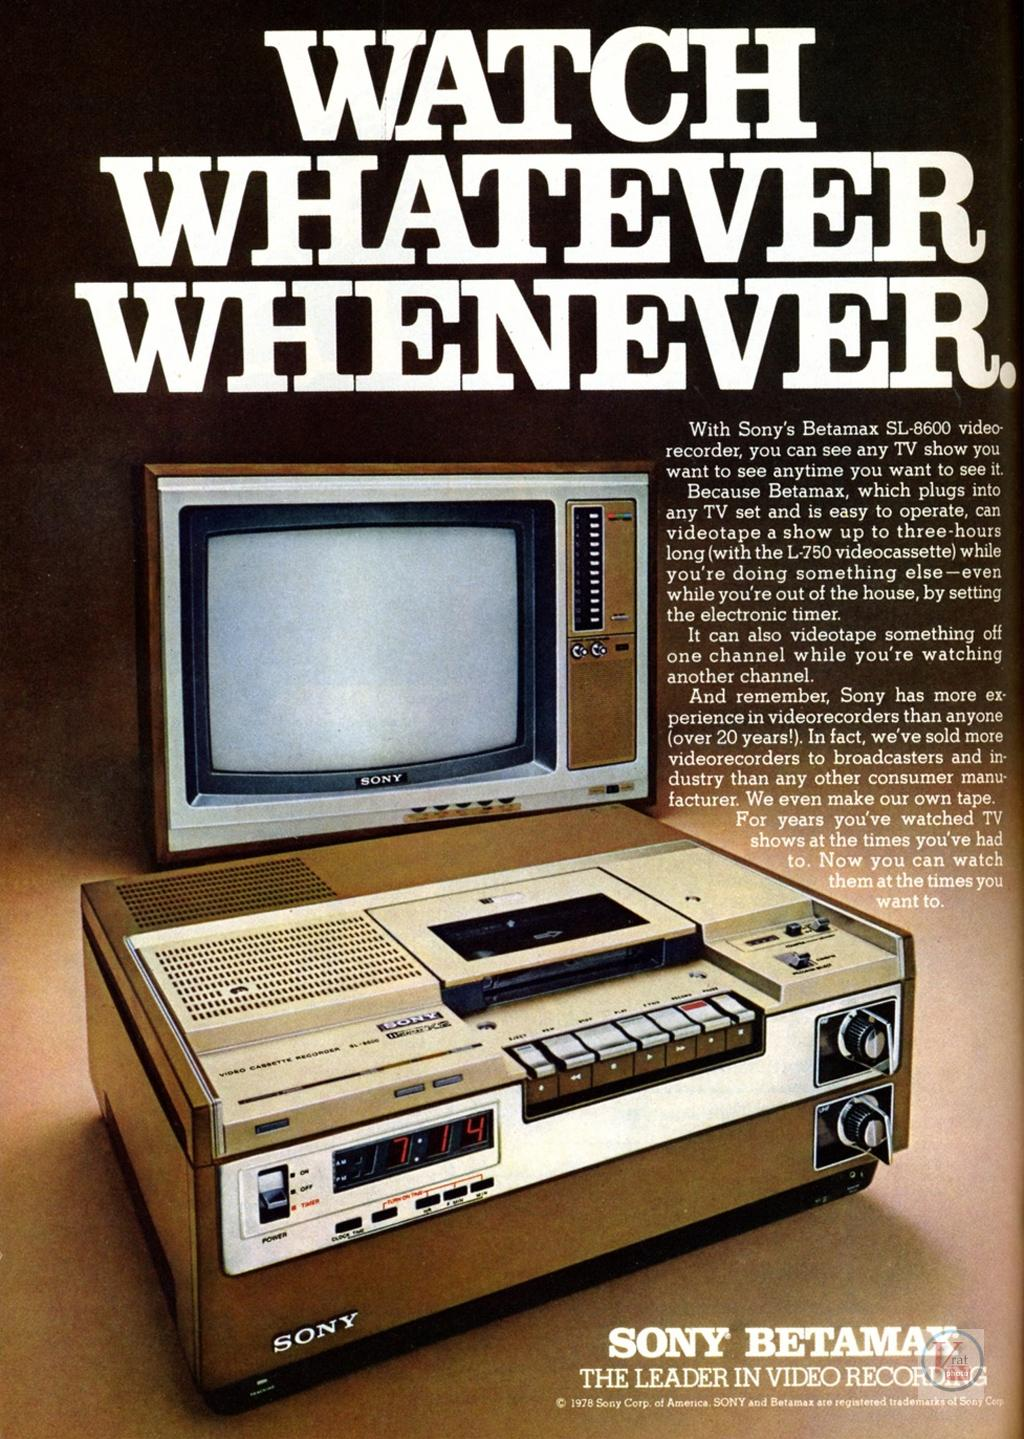 Sony Betamax VCR 23